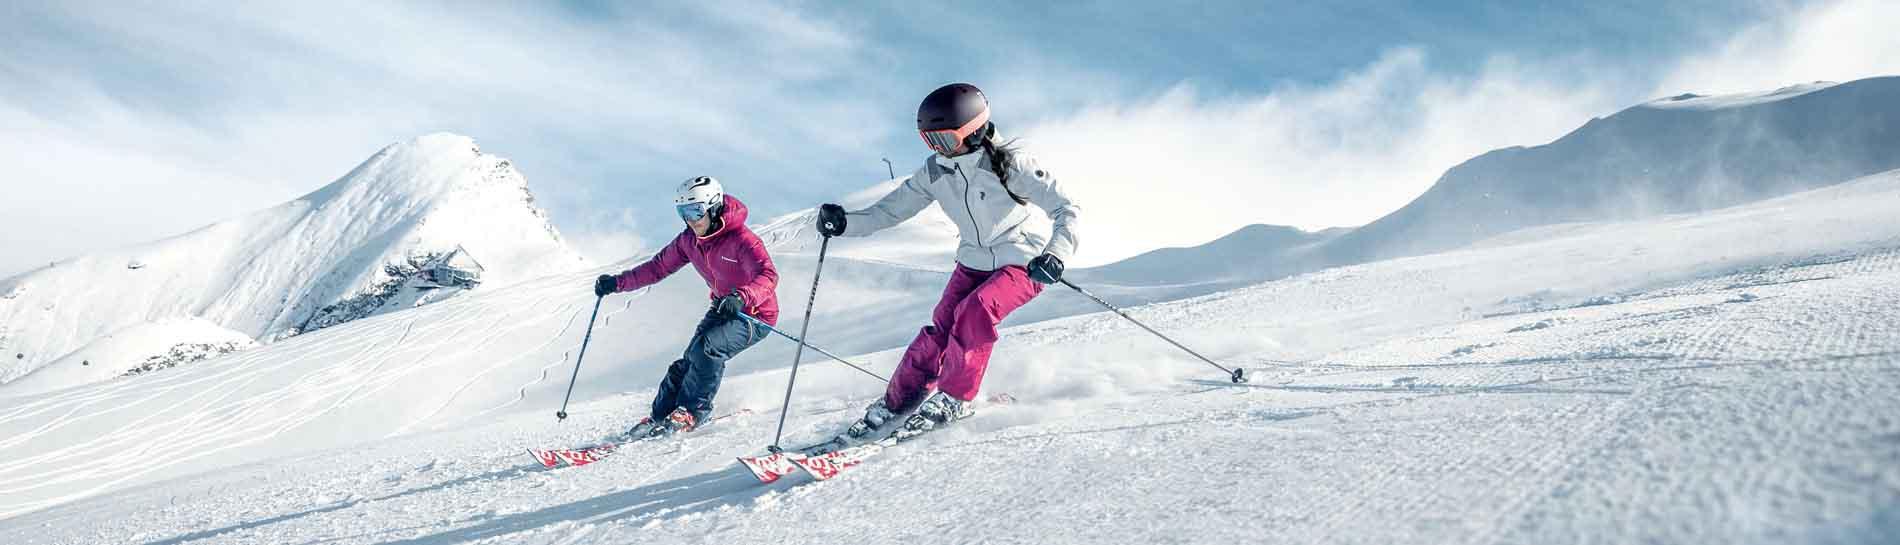 niche destinations Experiences Ski Holidays Austria Tyrol SalzburgerLand